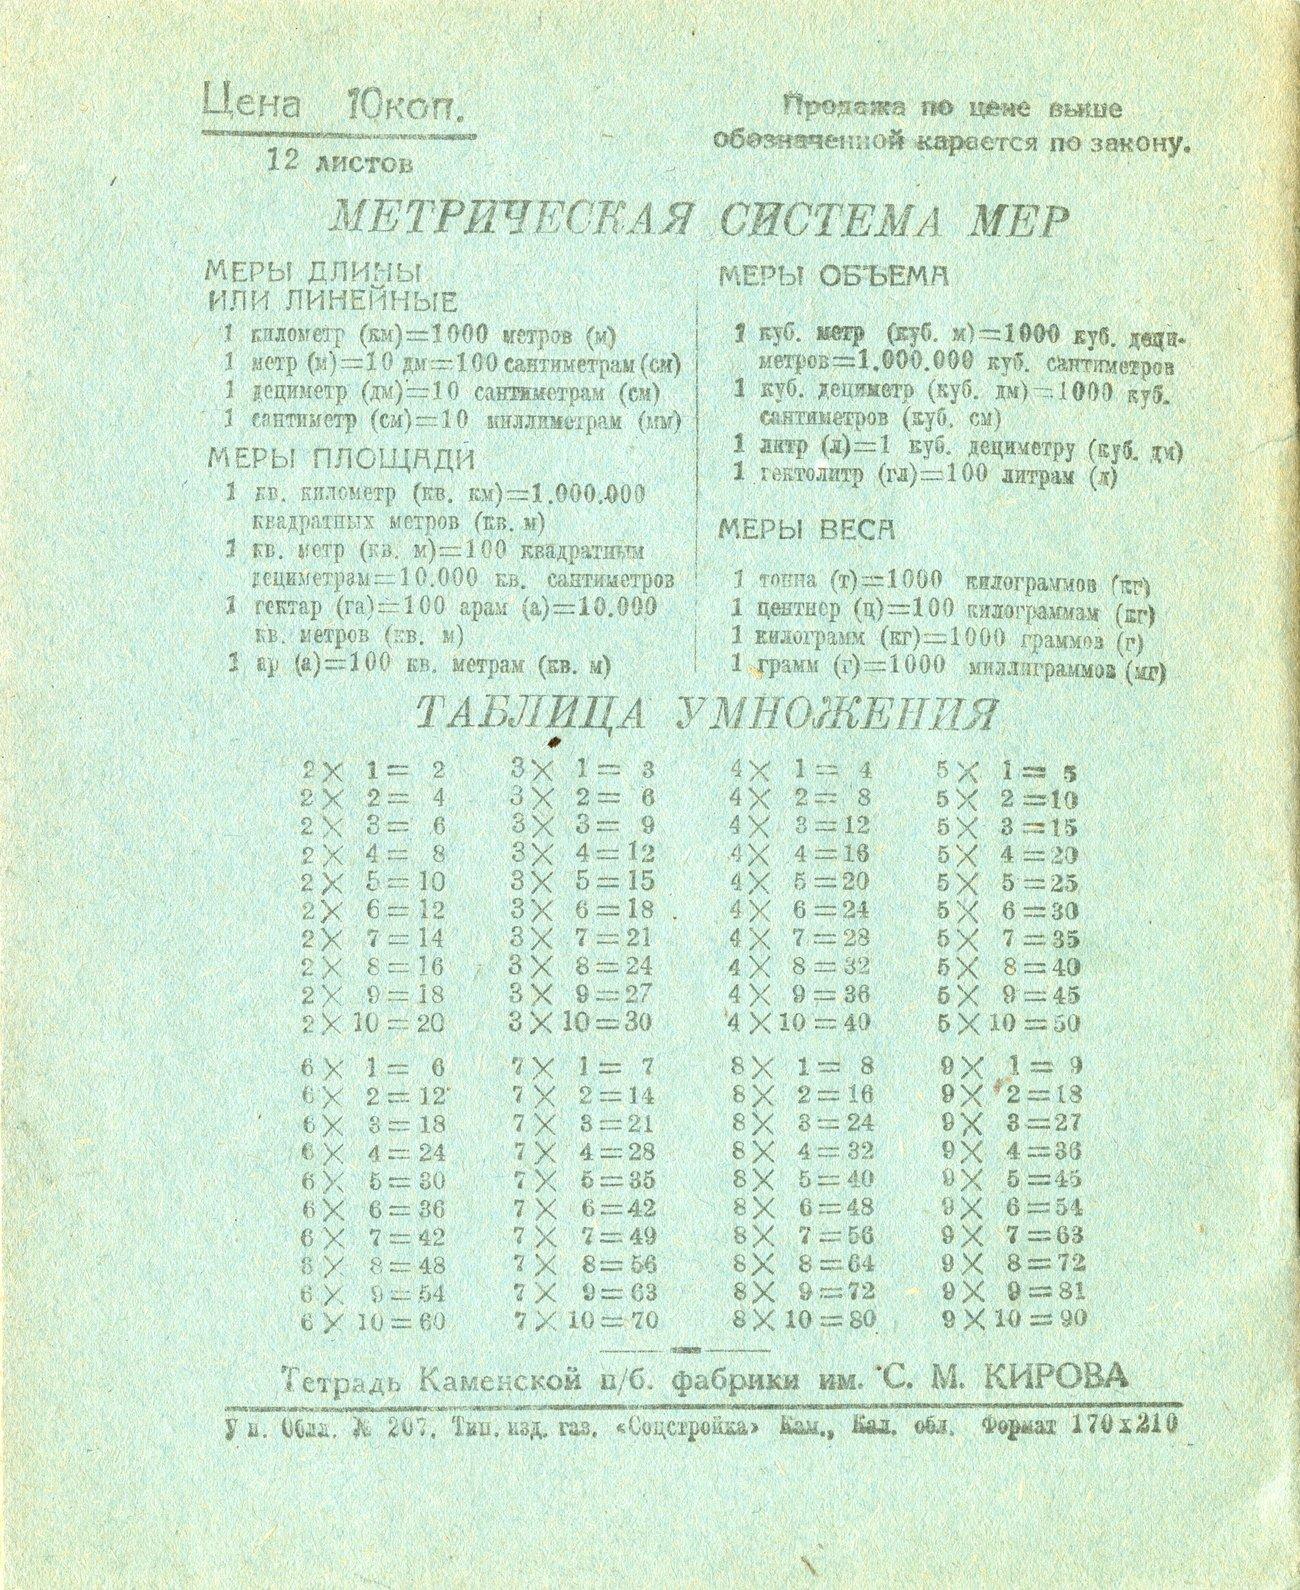 Тетрадь СССР 35 оборот